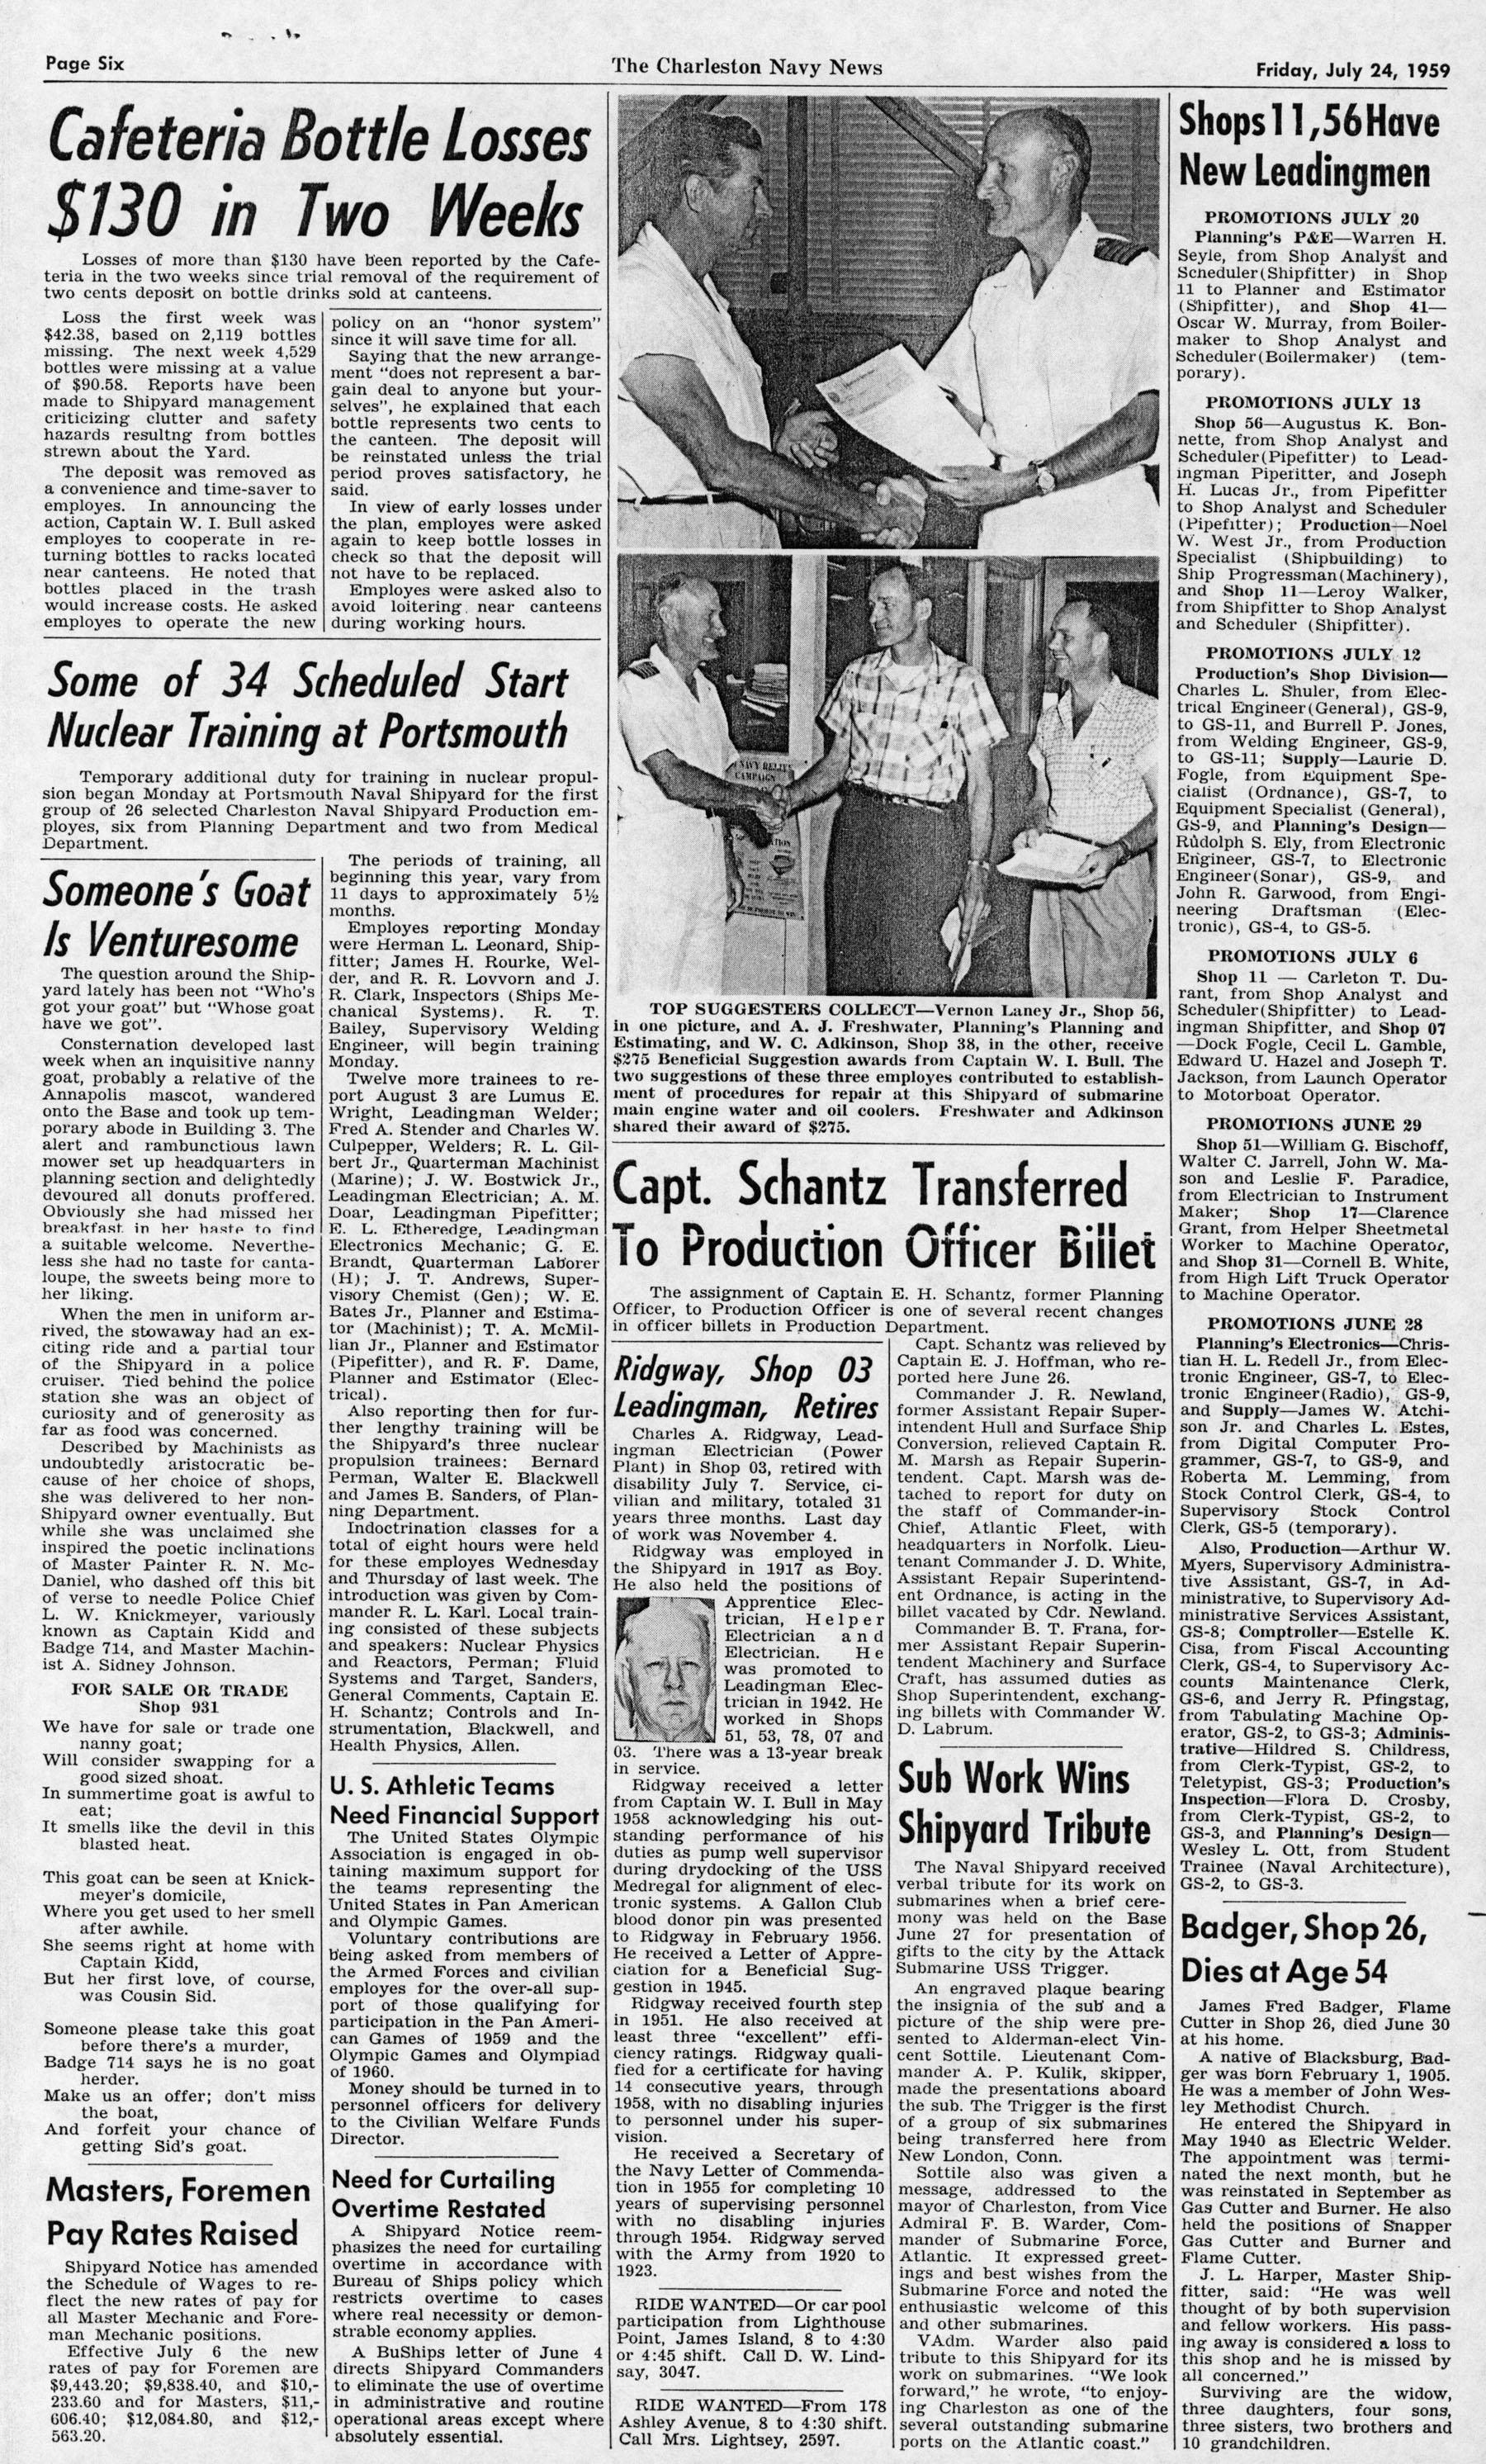 The Charleston Navy News, Volume 18, Edition 1, page vi